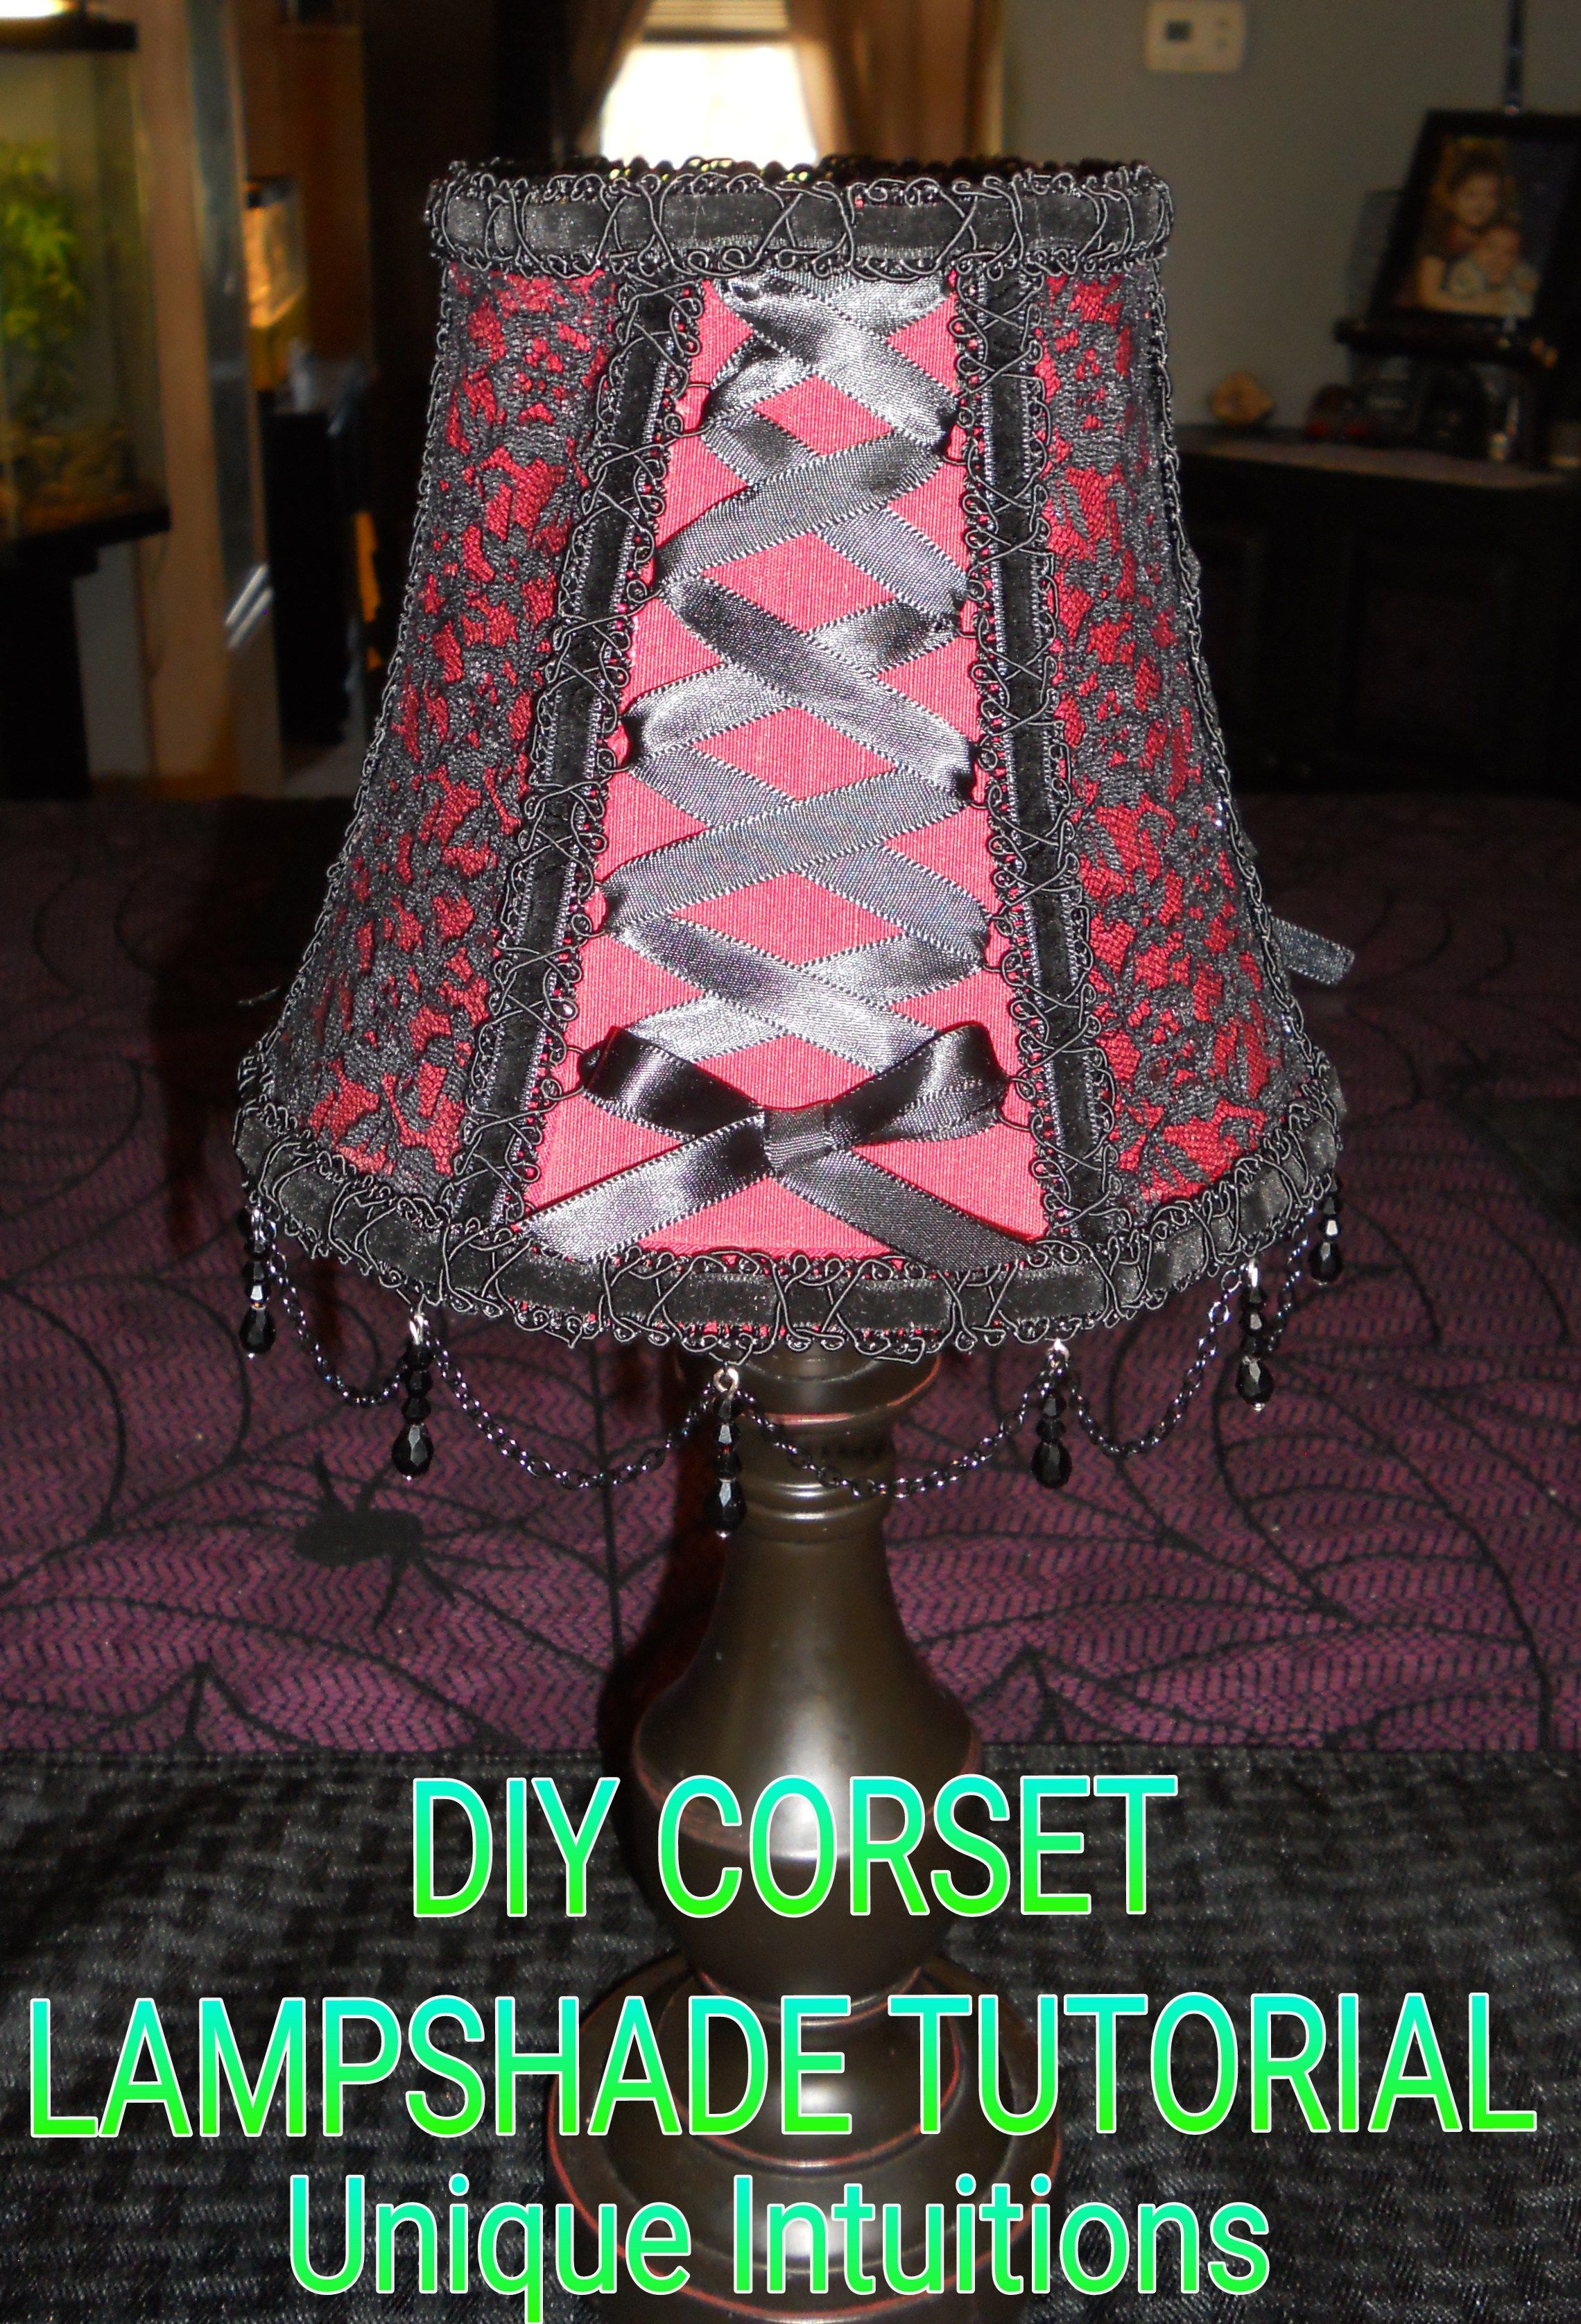 DIY Easy No Sew Corset Lampshade Tutorial #lampshade #homedecor #diydecor…